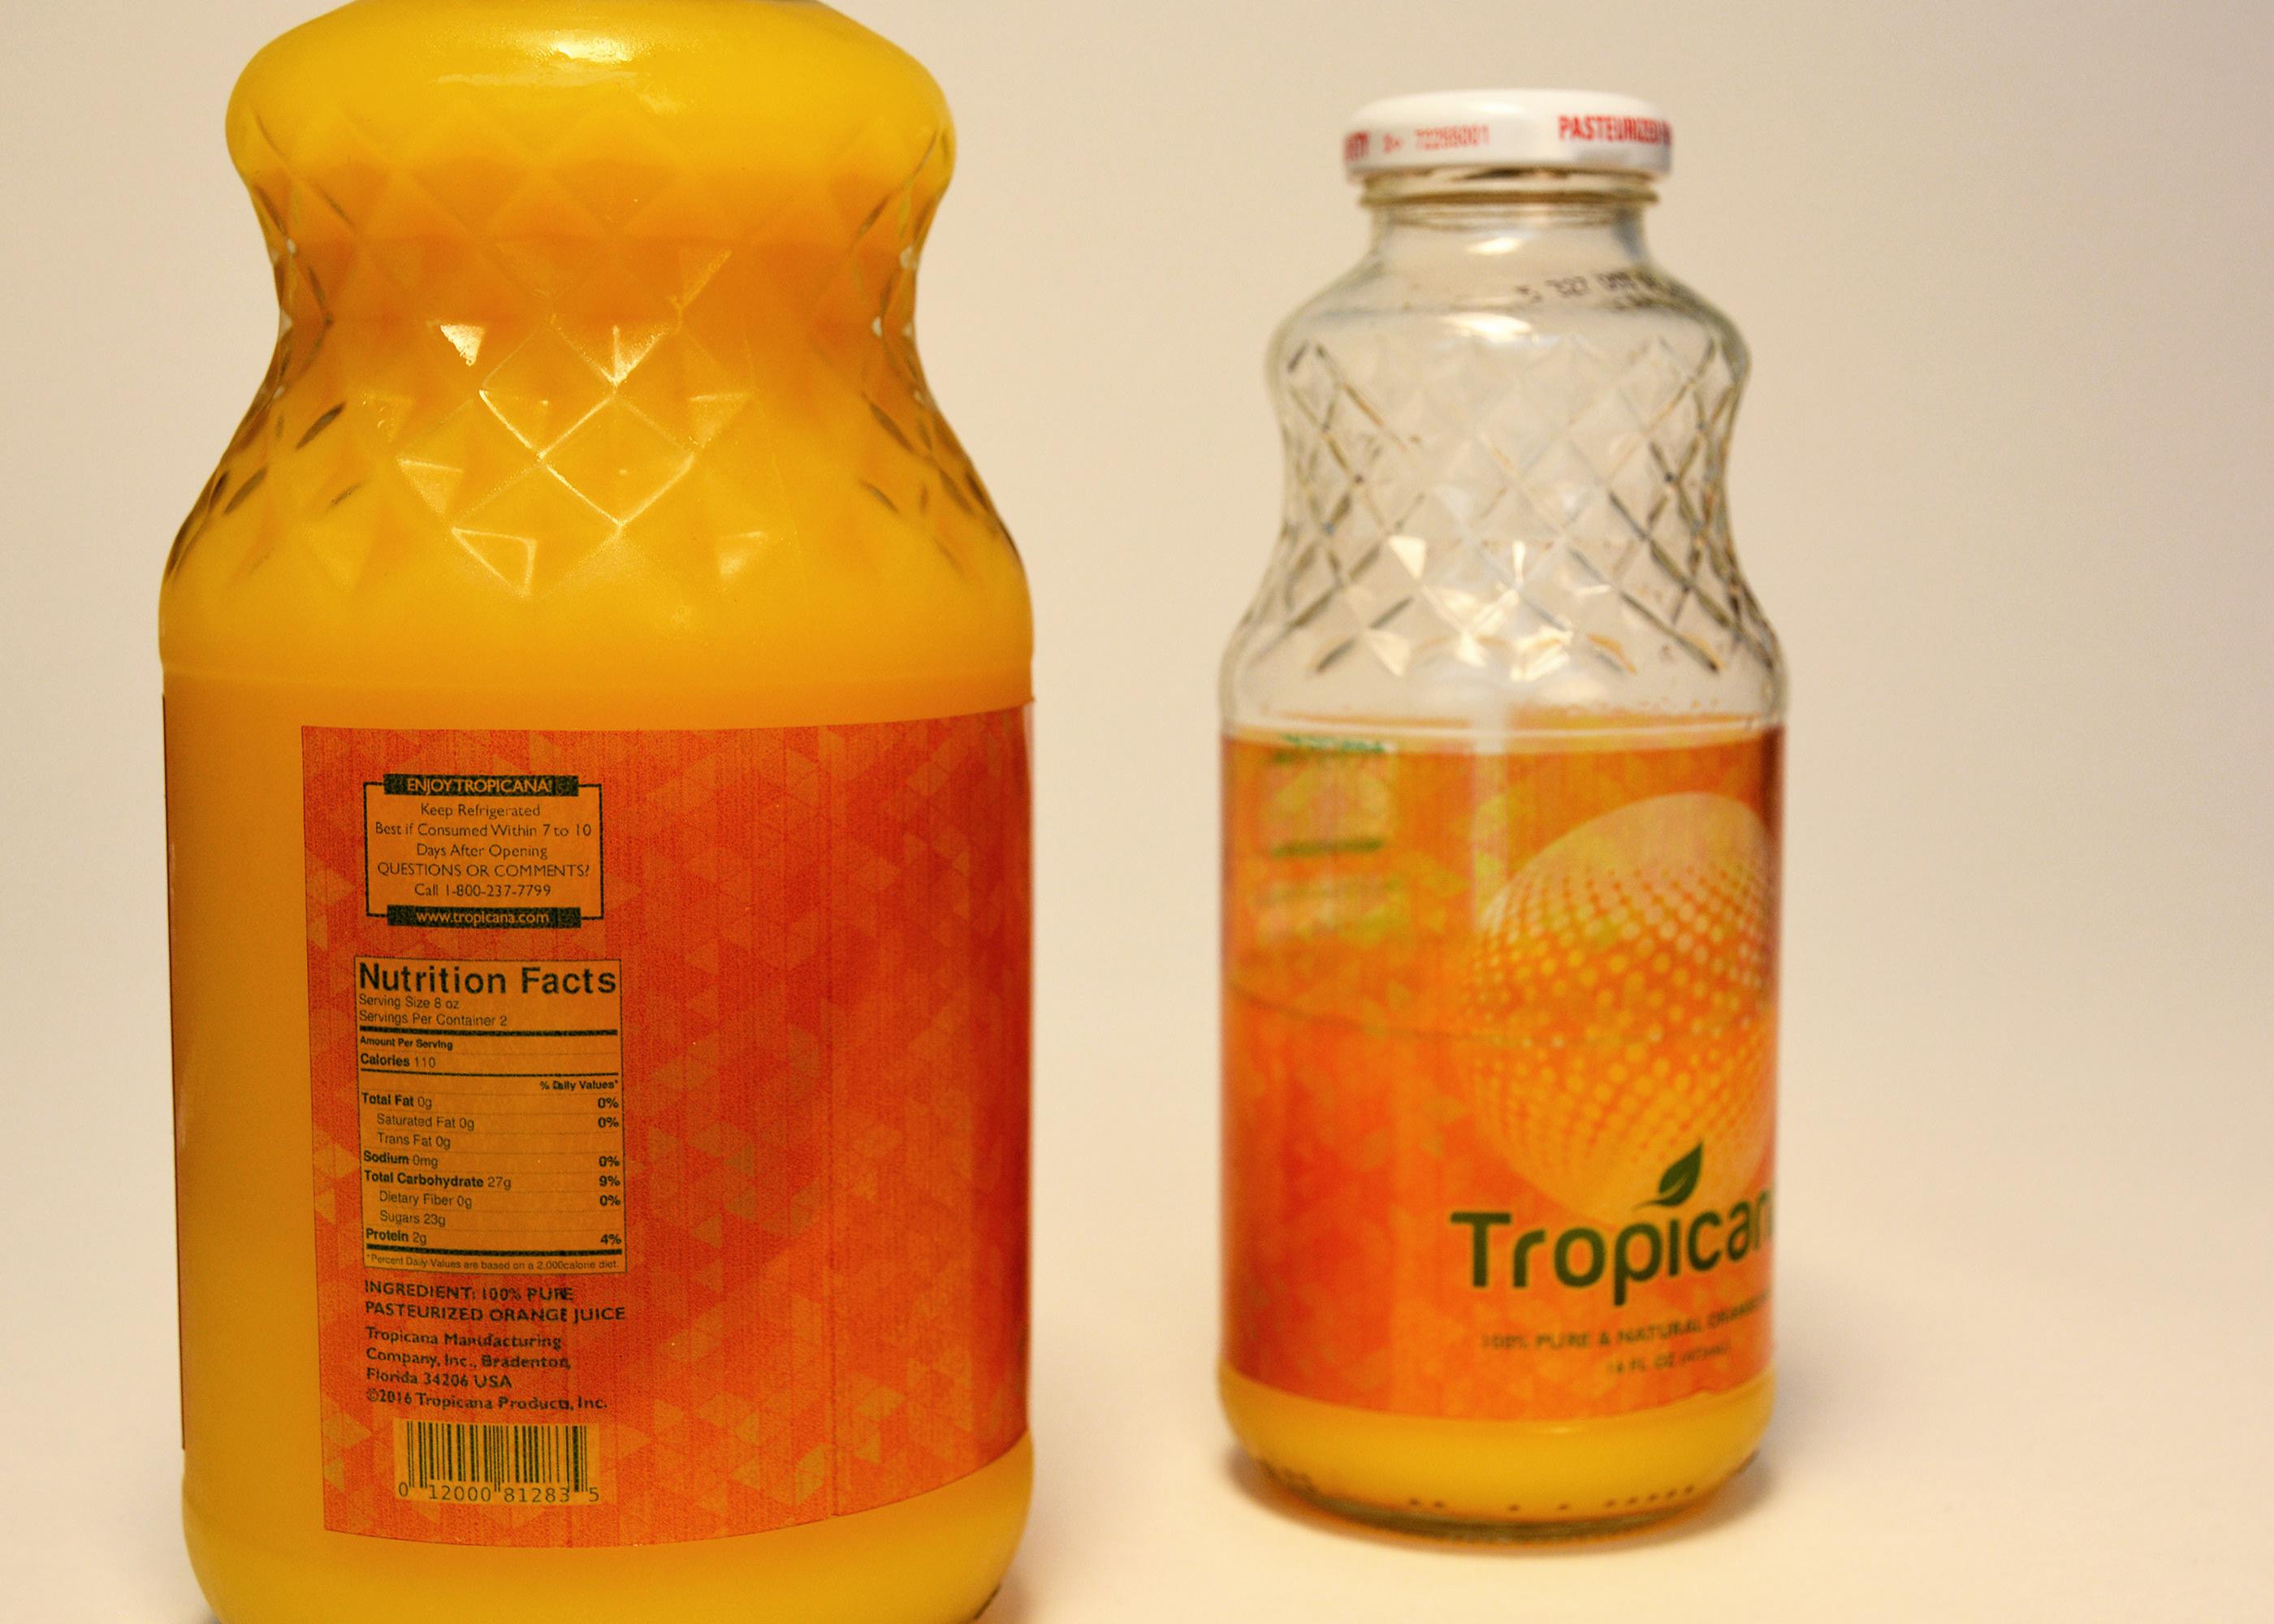 Save $1 on Tropicana Pure Premium Orange Juice & Deals